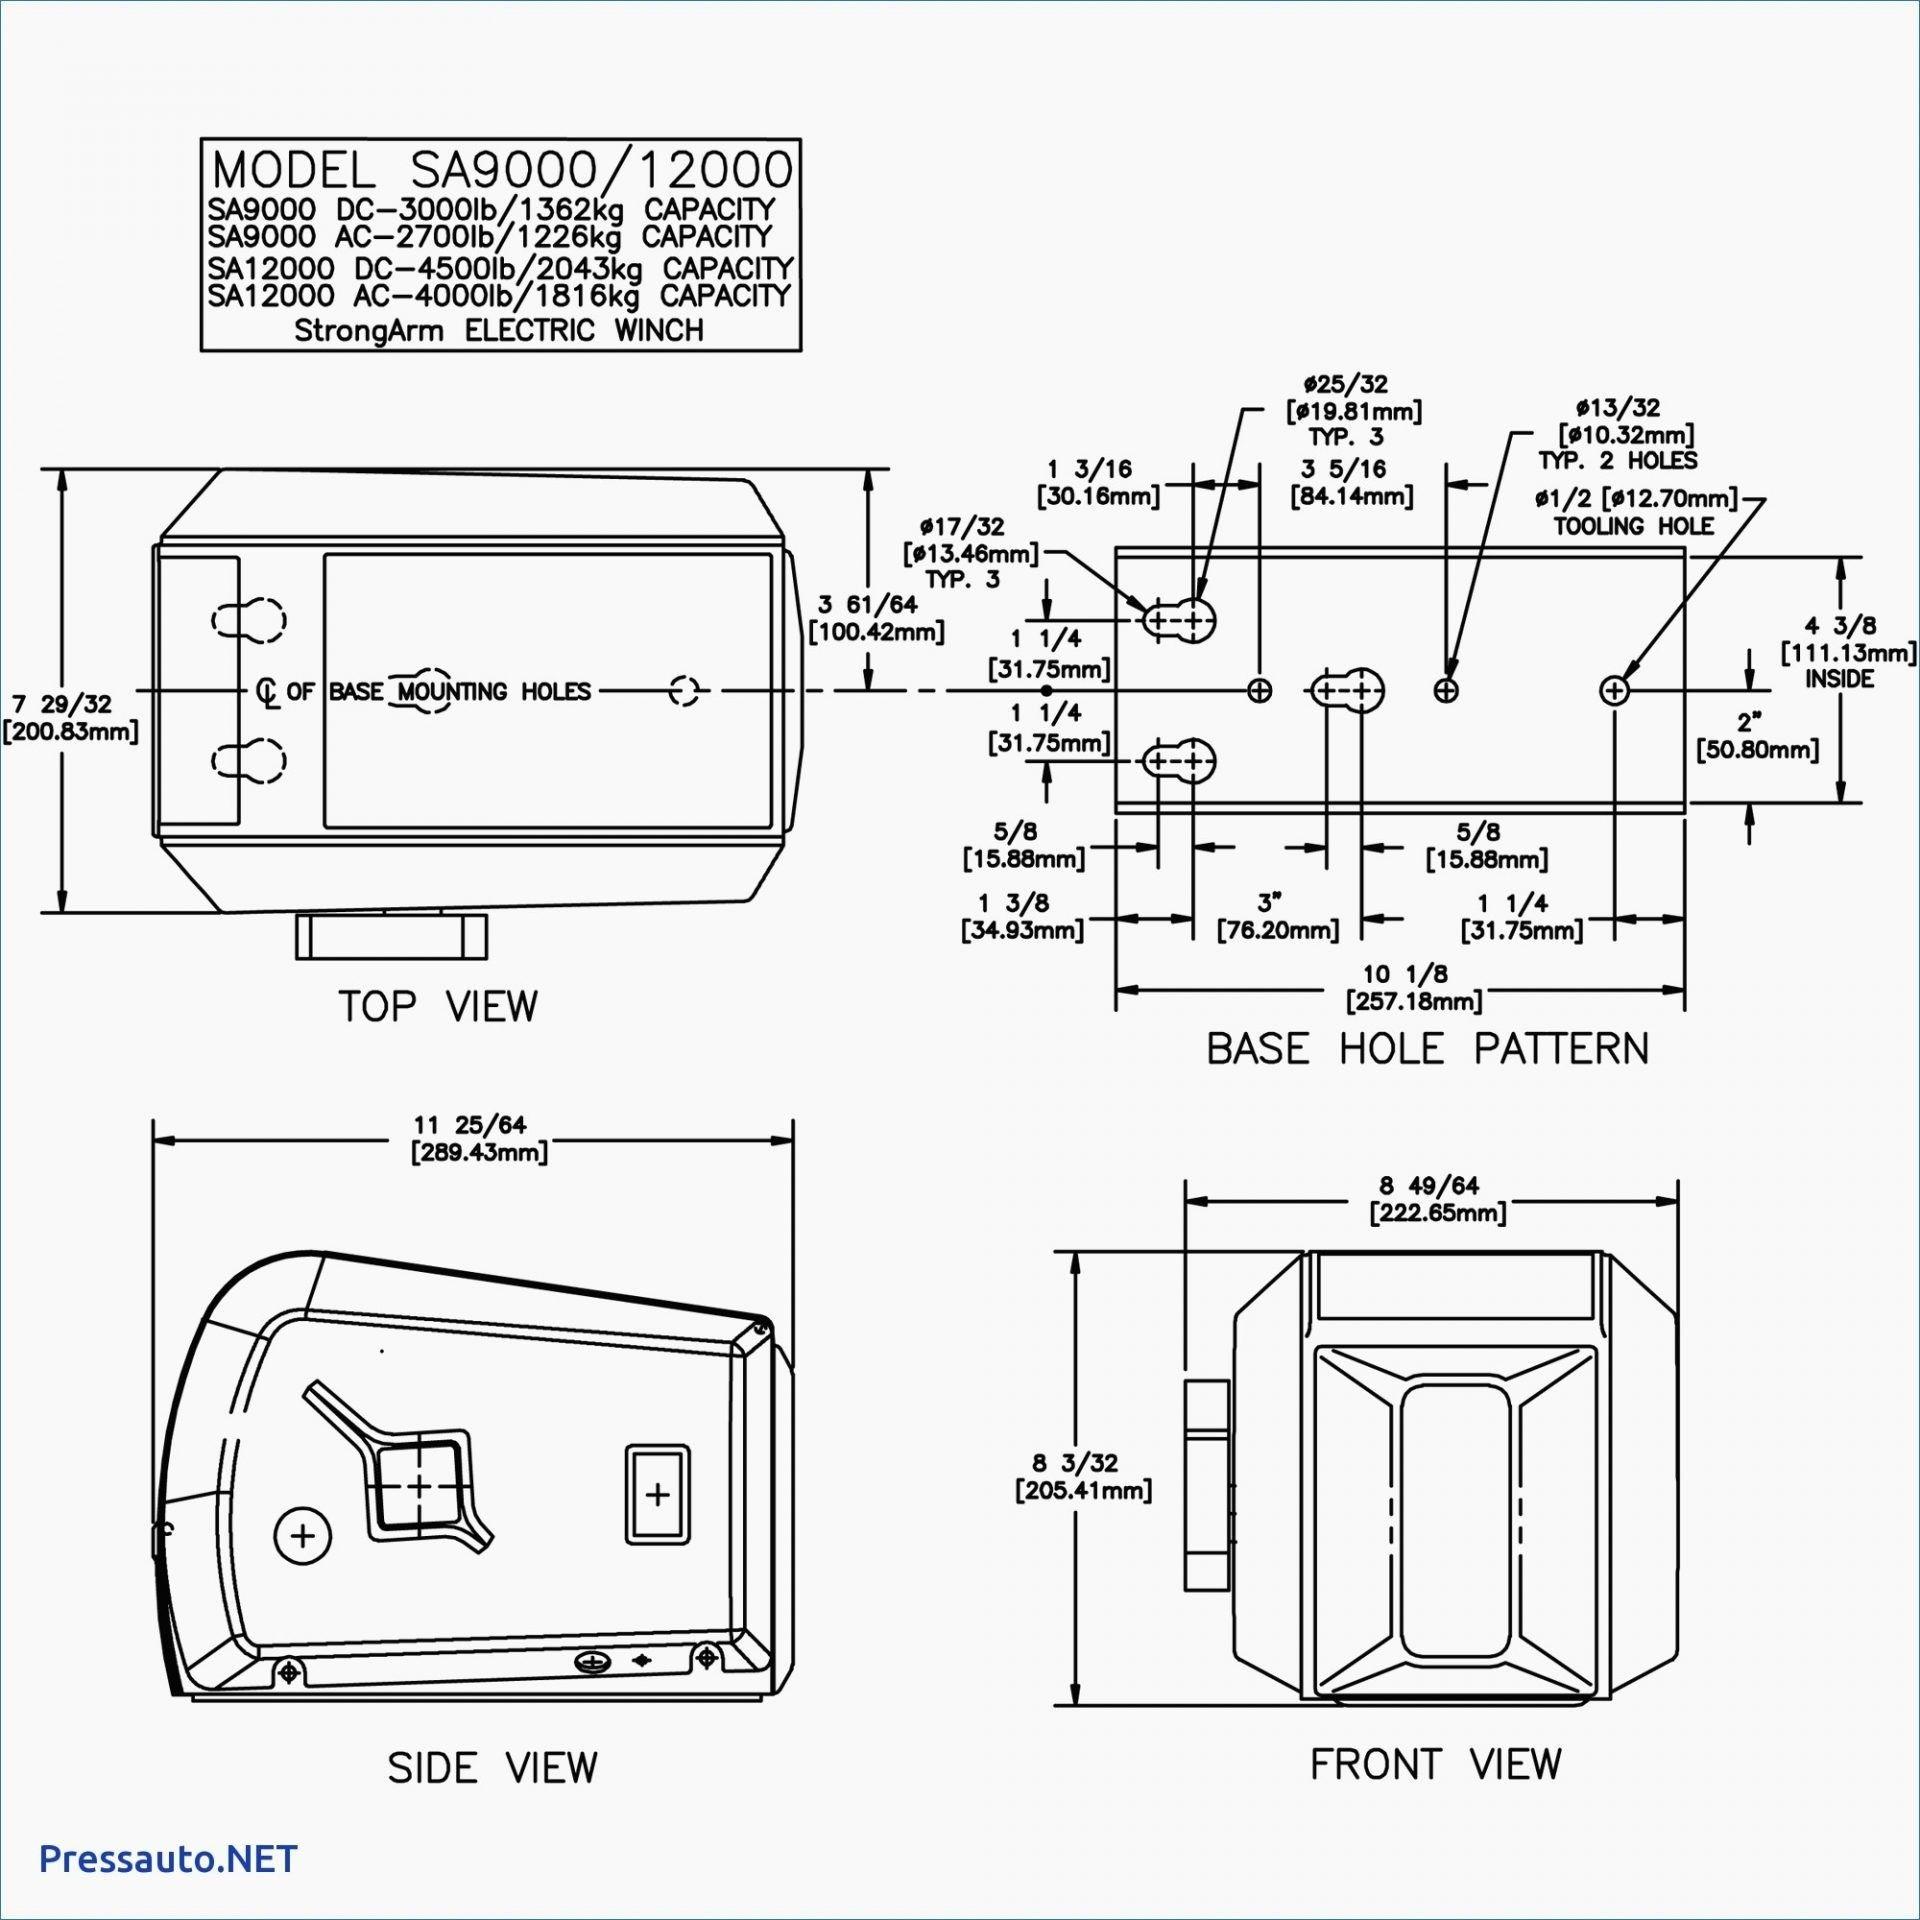 Inspirational Atv Winch Solenoid Wiring Diagram In 2020 Warn Winch Winch Solenoid Winch